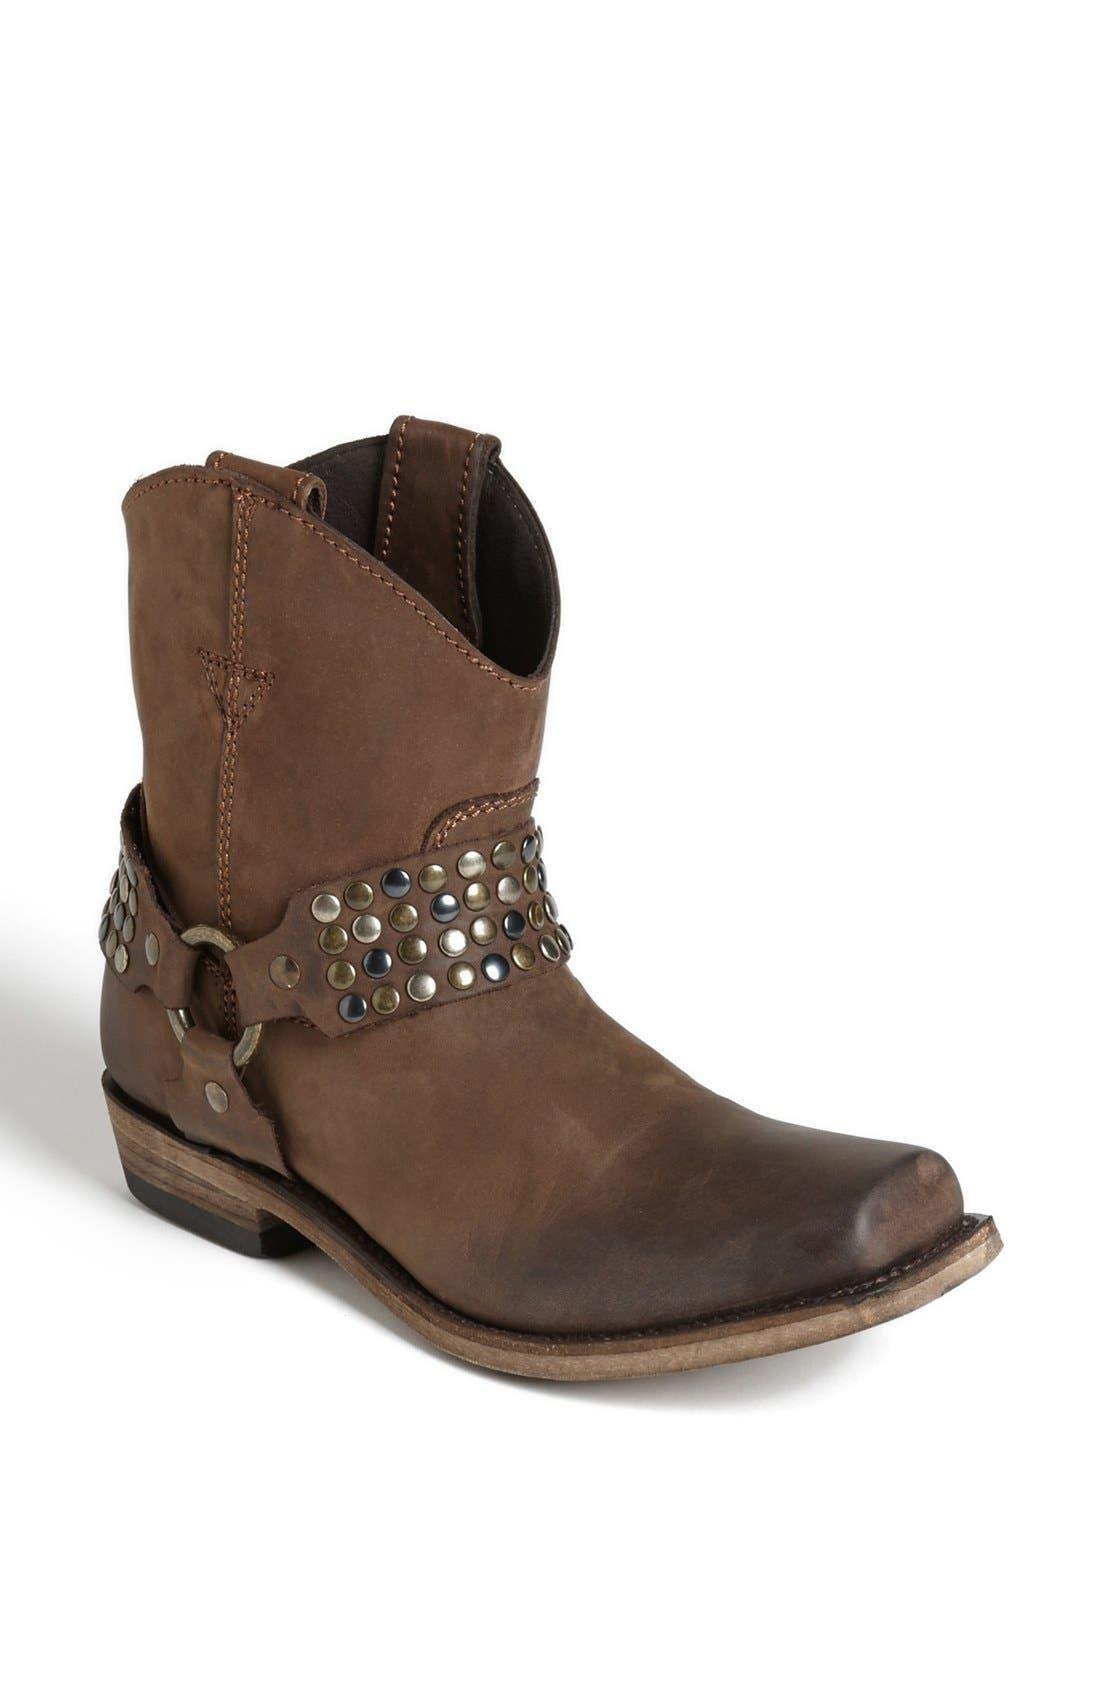 Alternate Image 1 Selected - Liberty Black Short Harness Boot